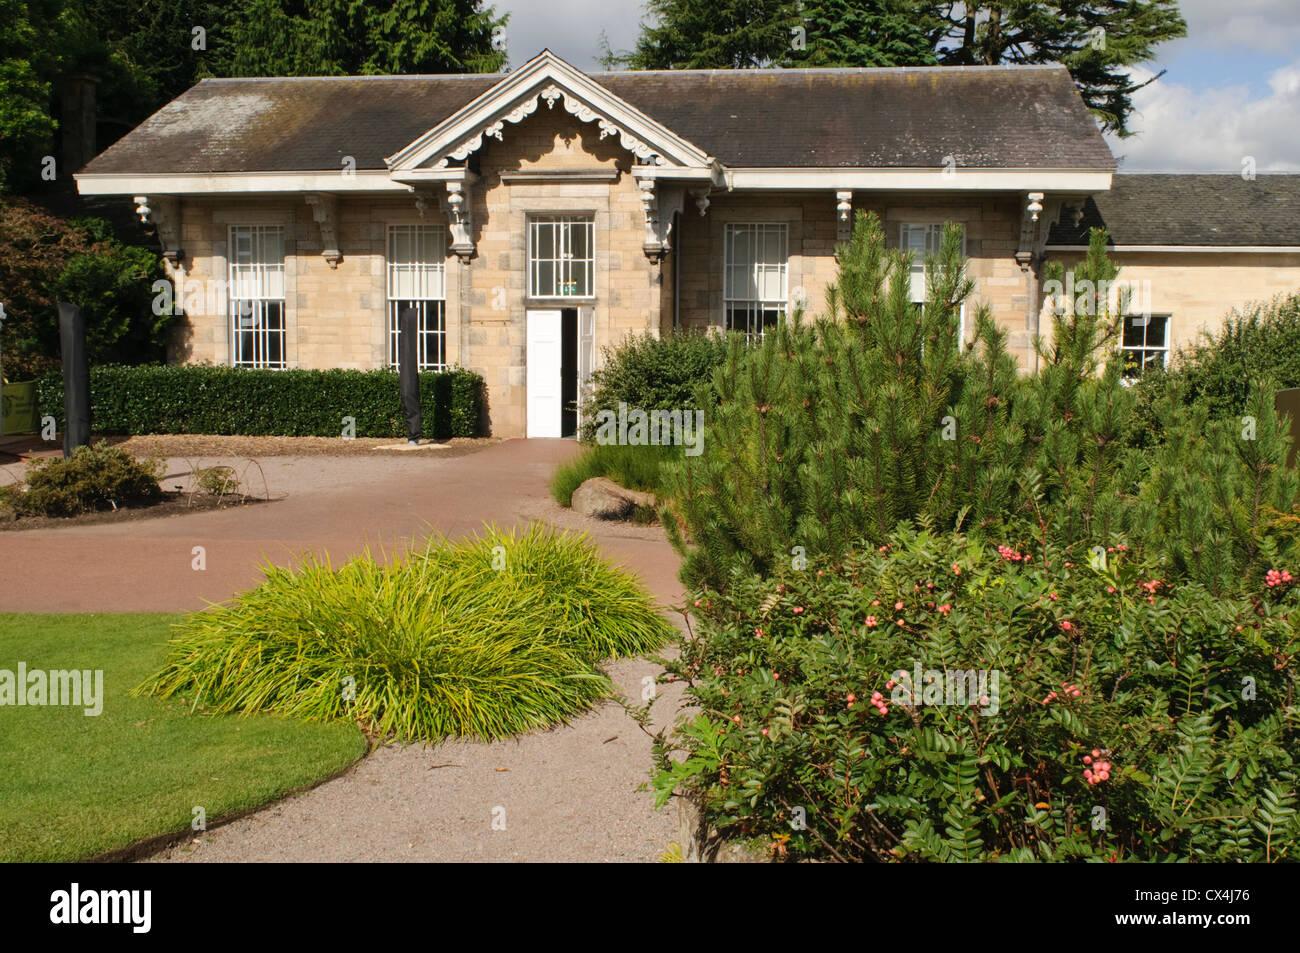 Royal Botanic Garden Edinburgh, The Caledonian Hall, viewed from the Rock Garden. - Stock Image